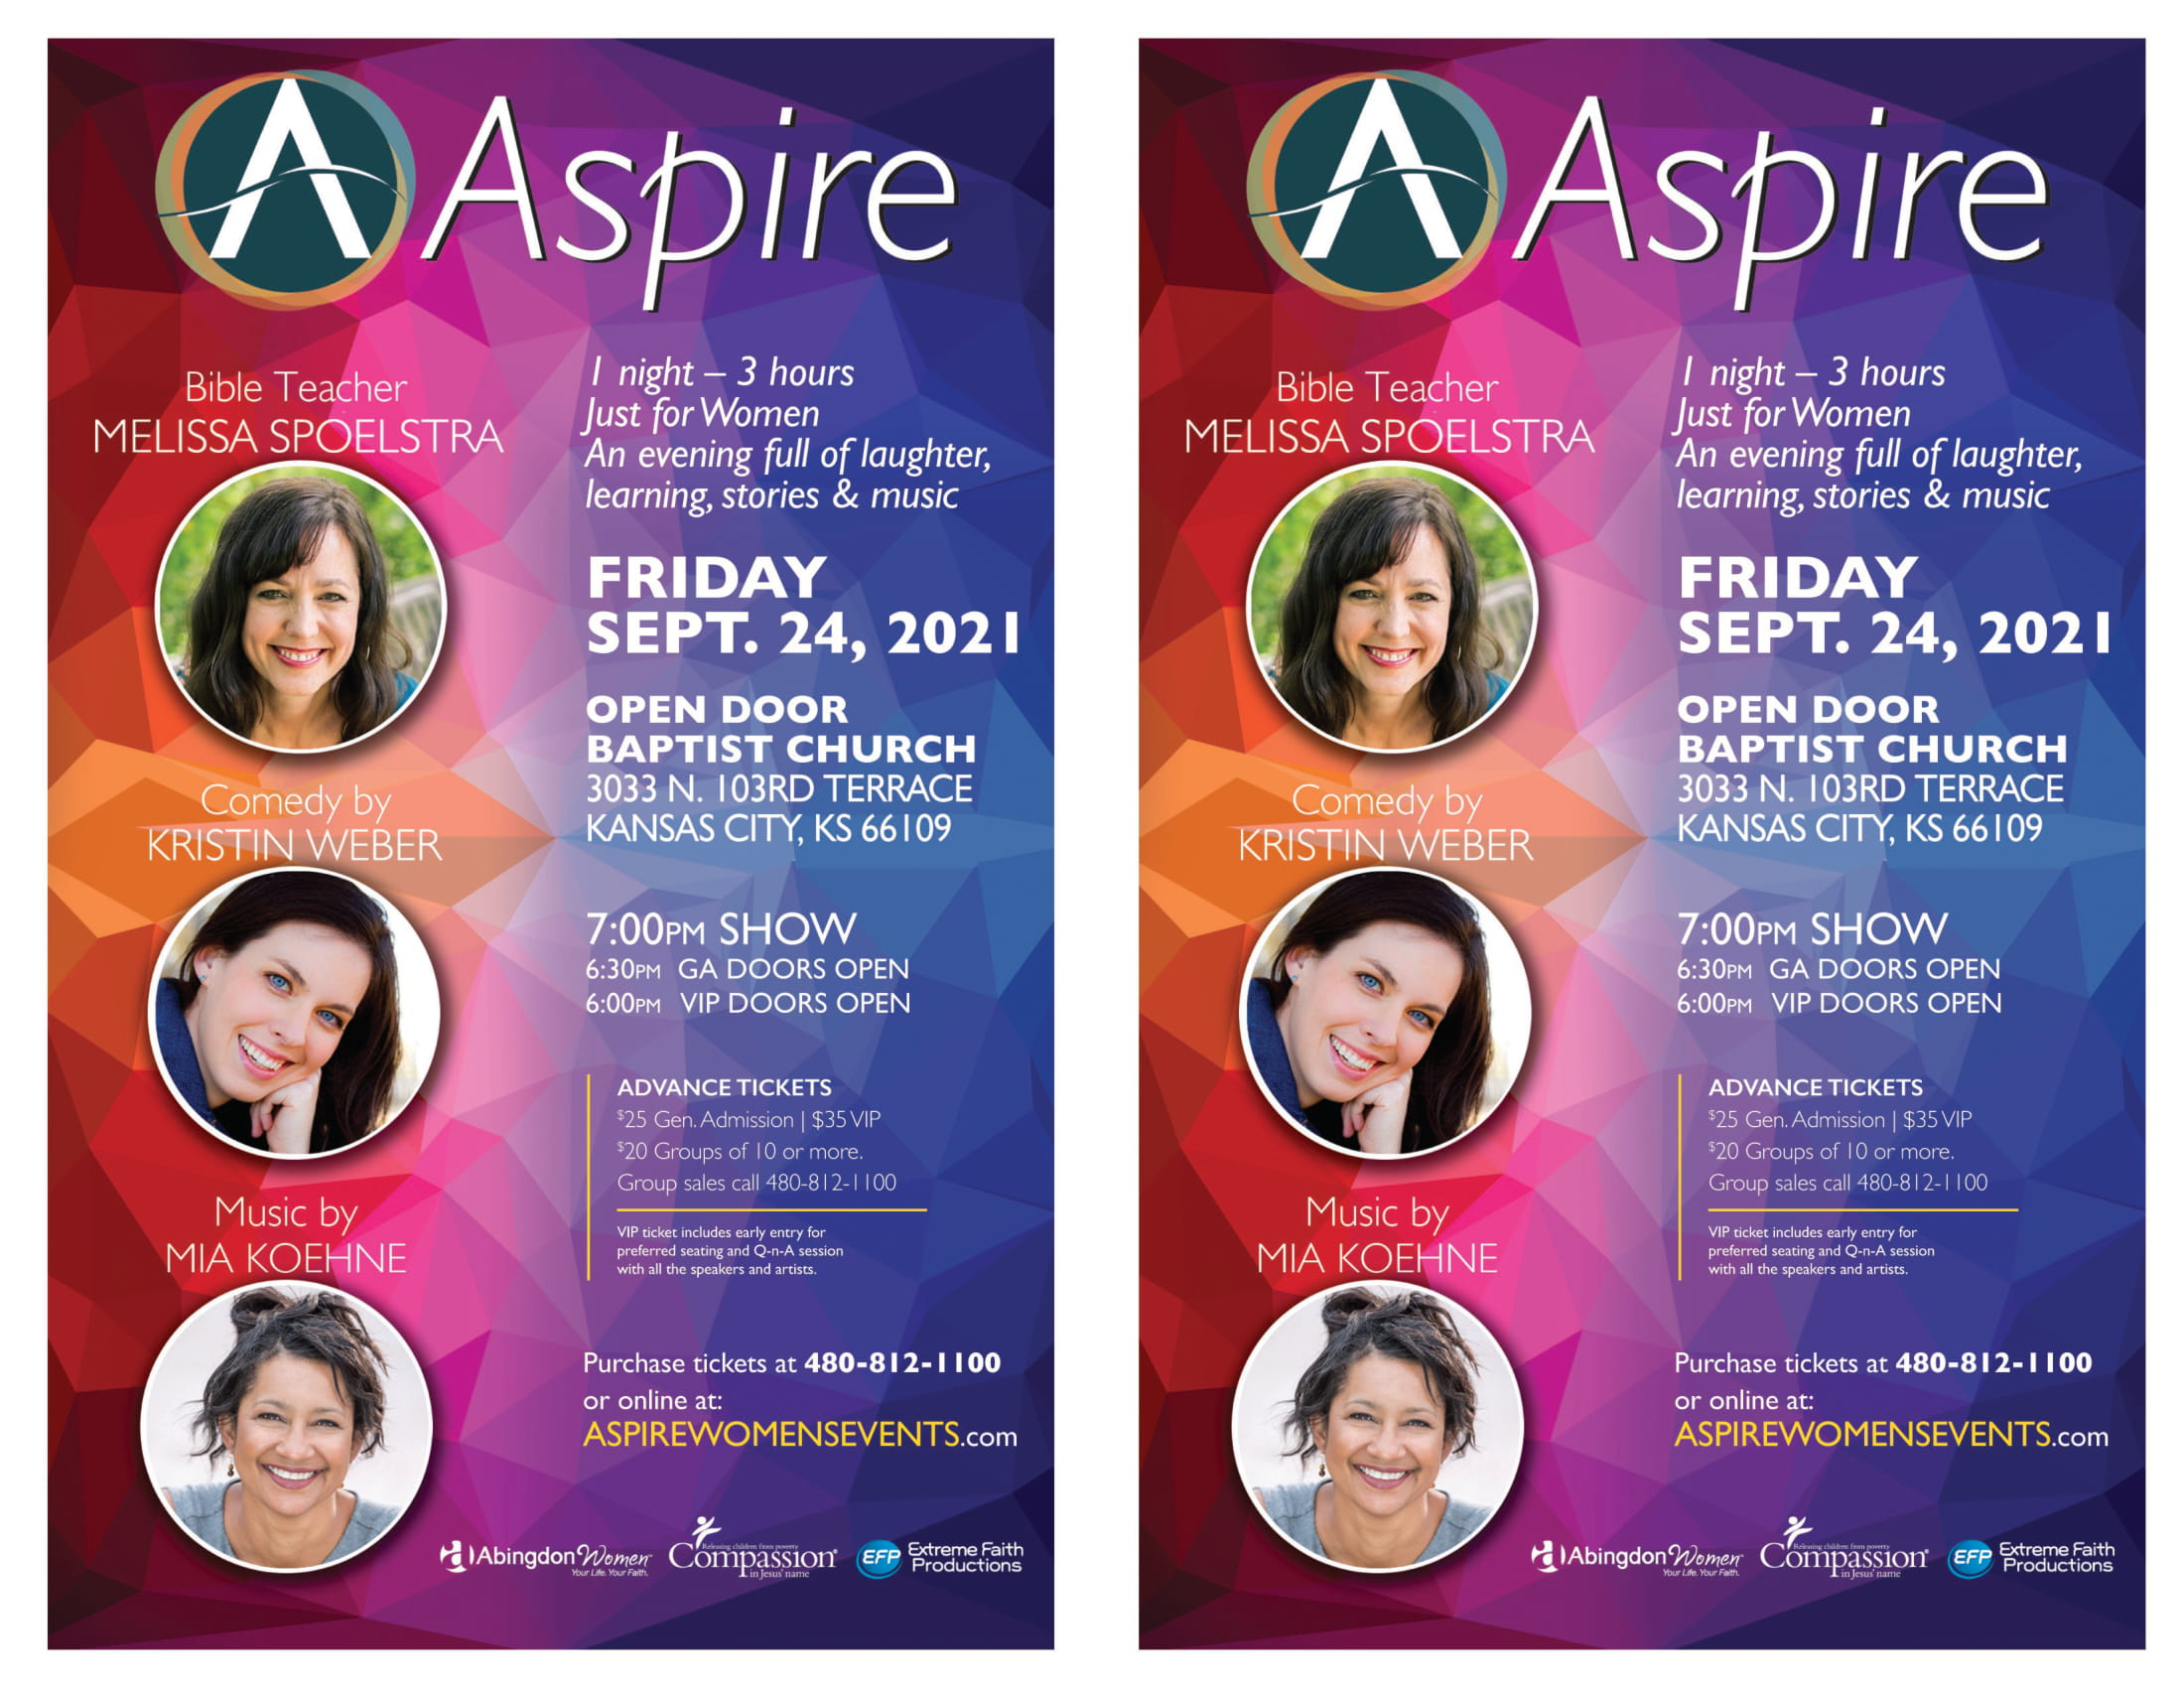 ASPIRE FRI Sept 24 Kansas City-2UP-1